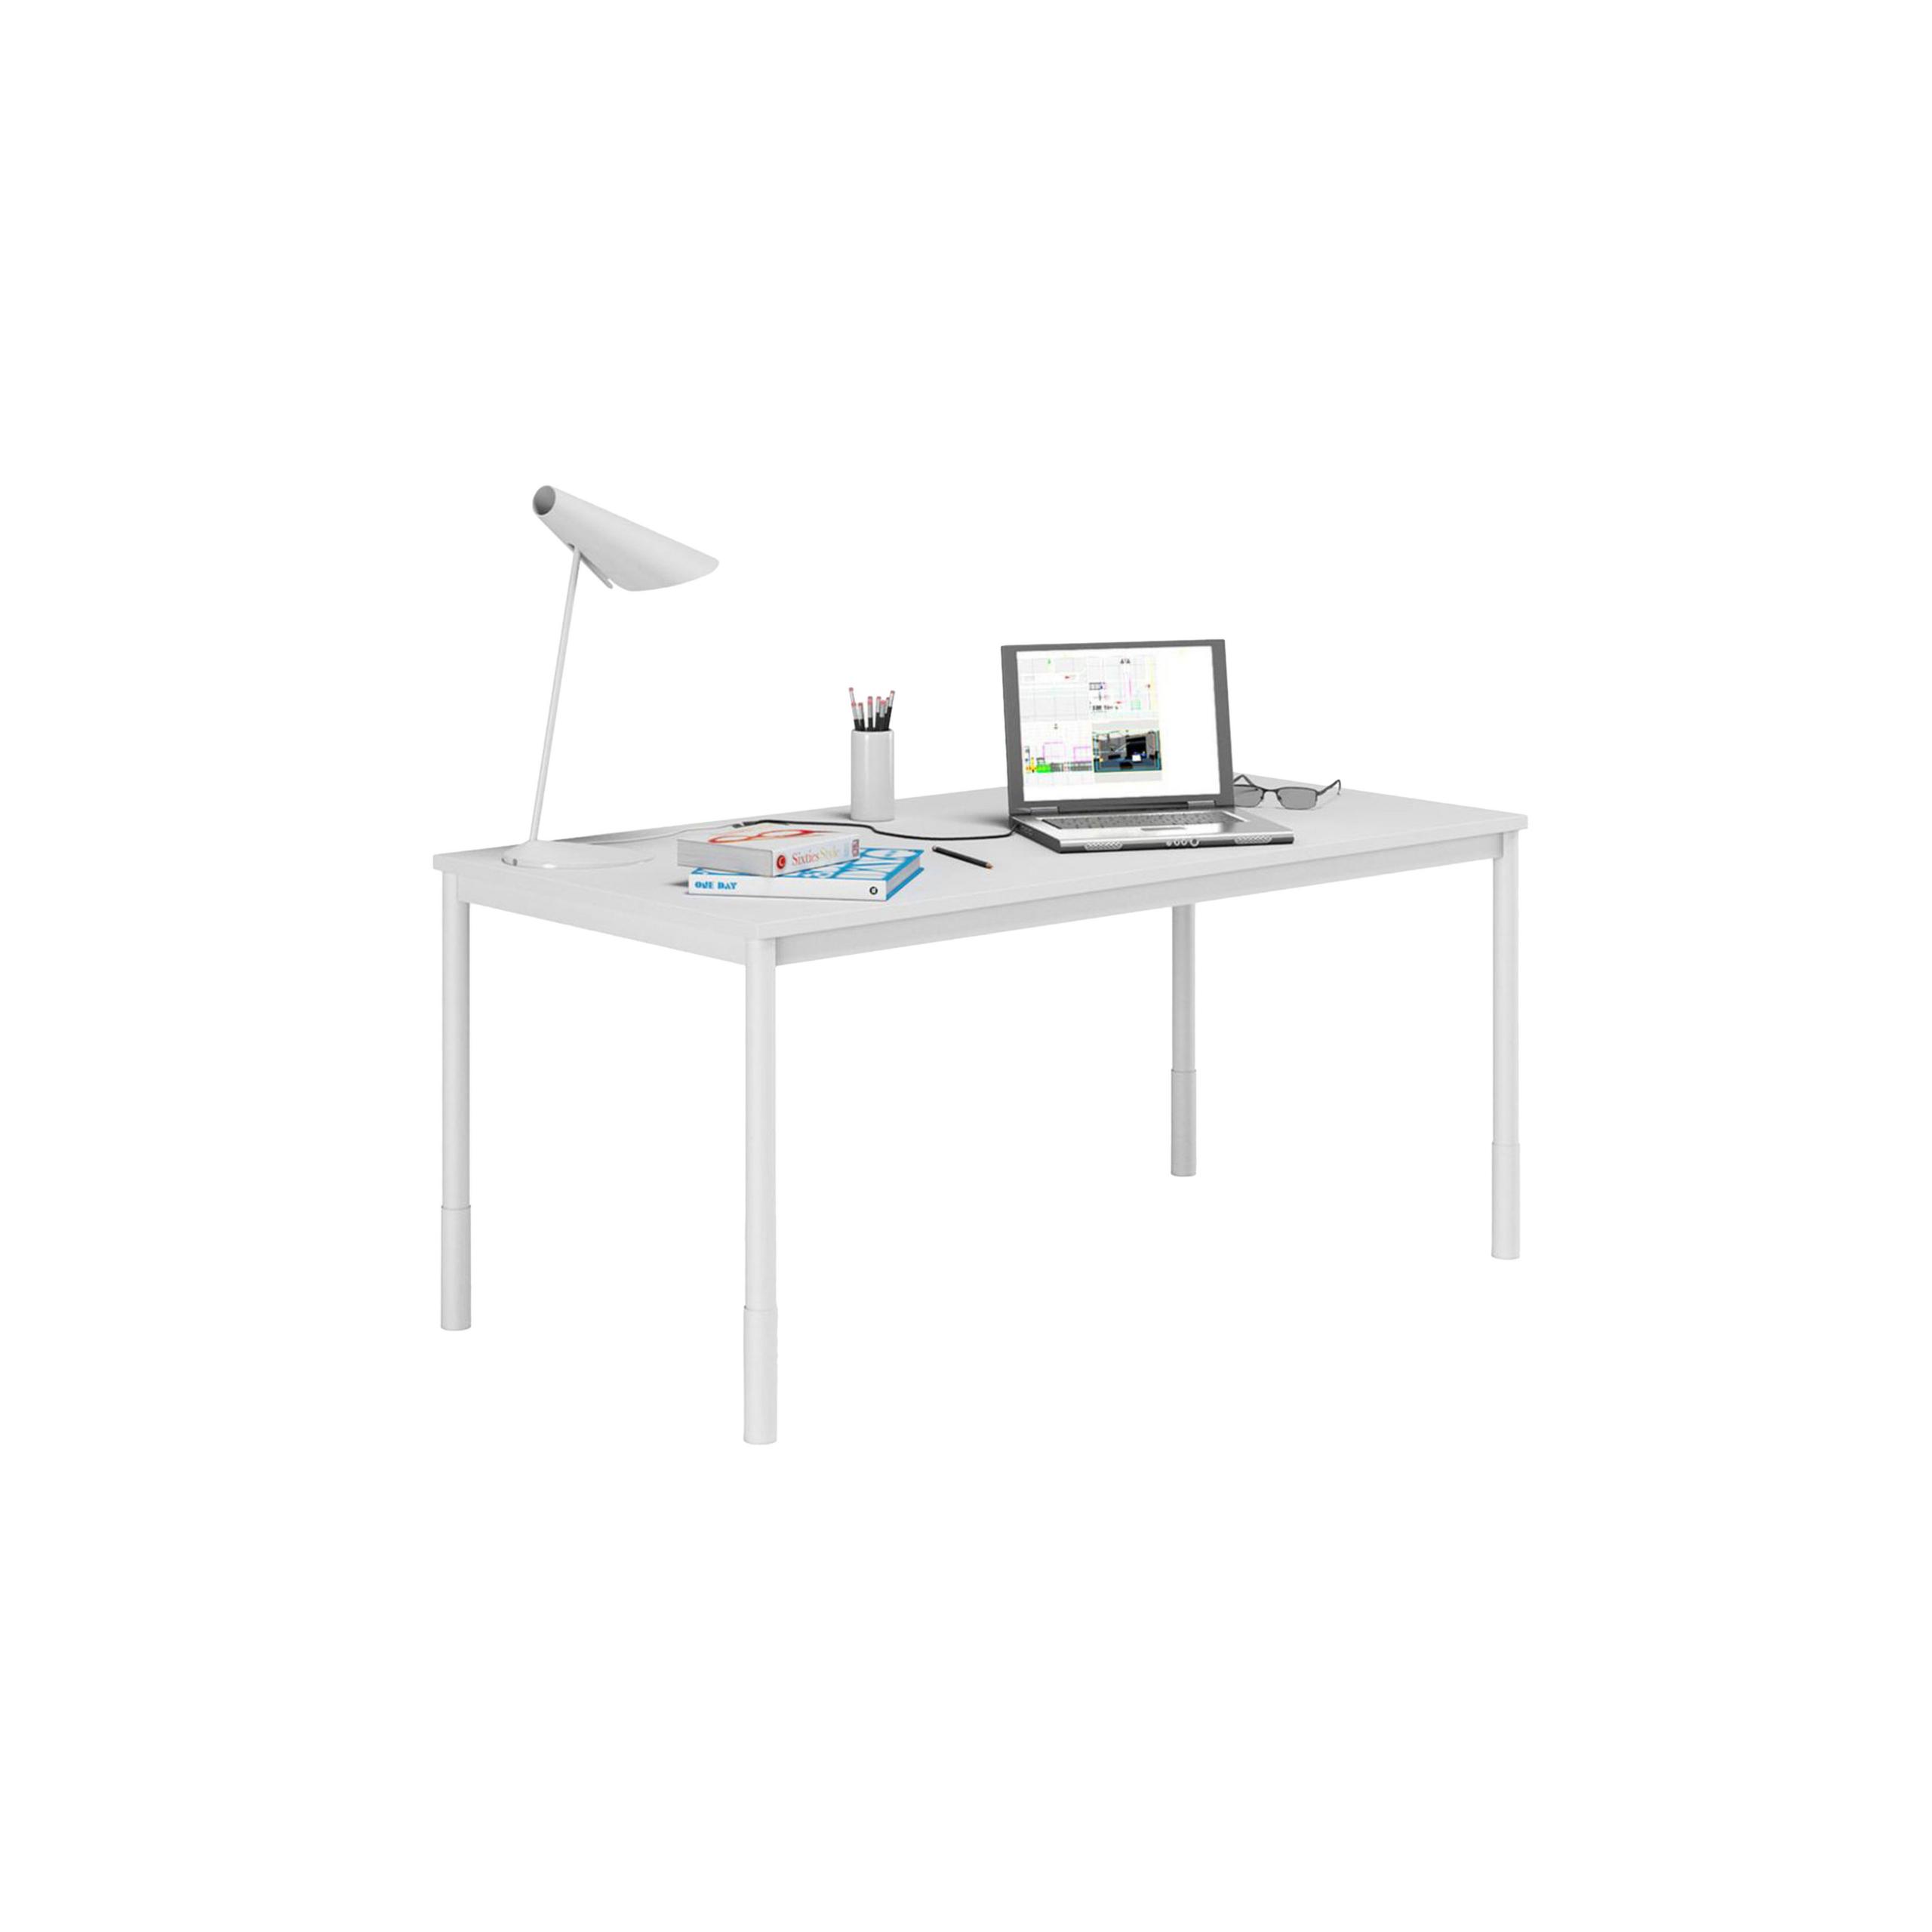 Deskmeeting table – EFG Team Pro